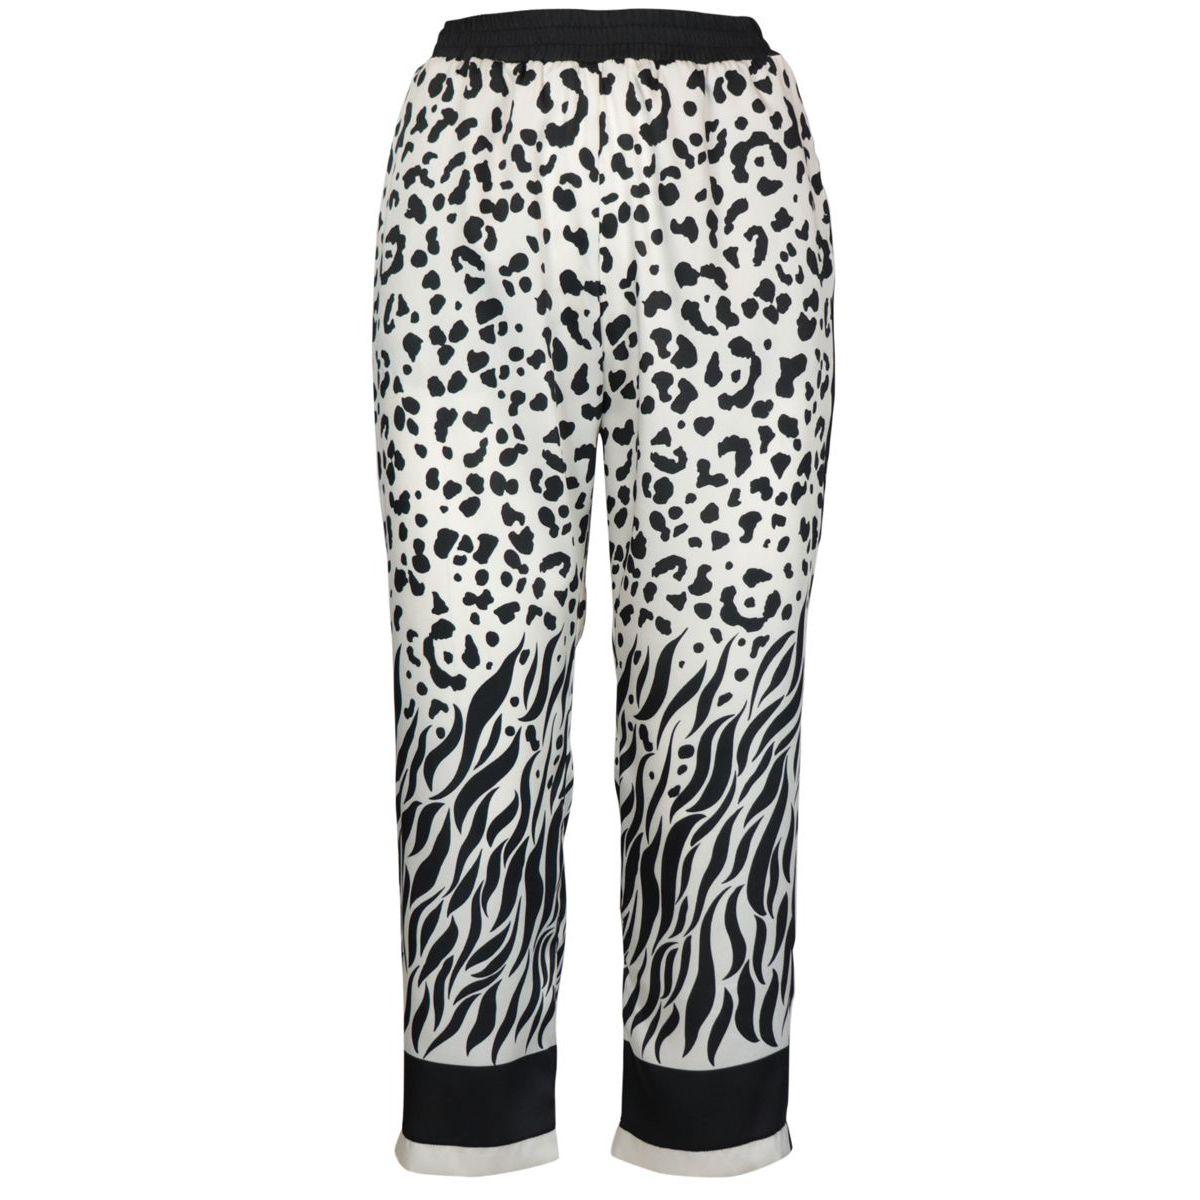 Pasticciotto trousers Spotted Pinko